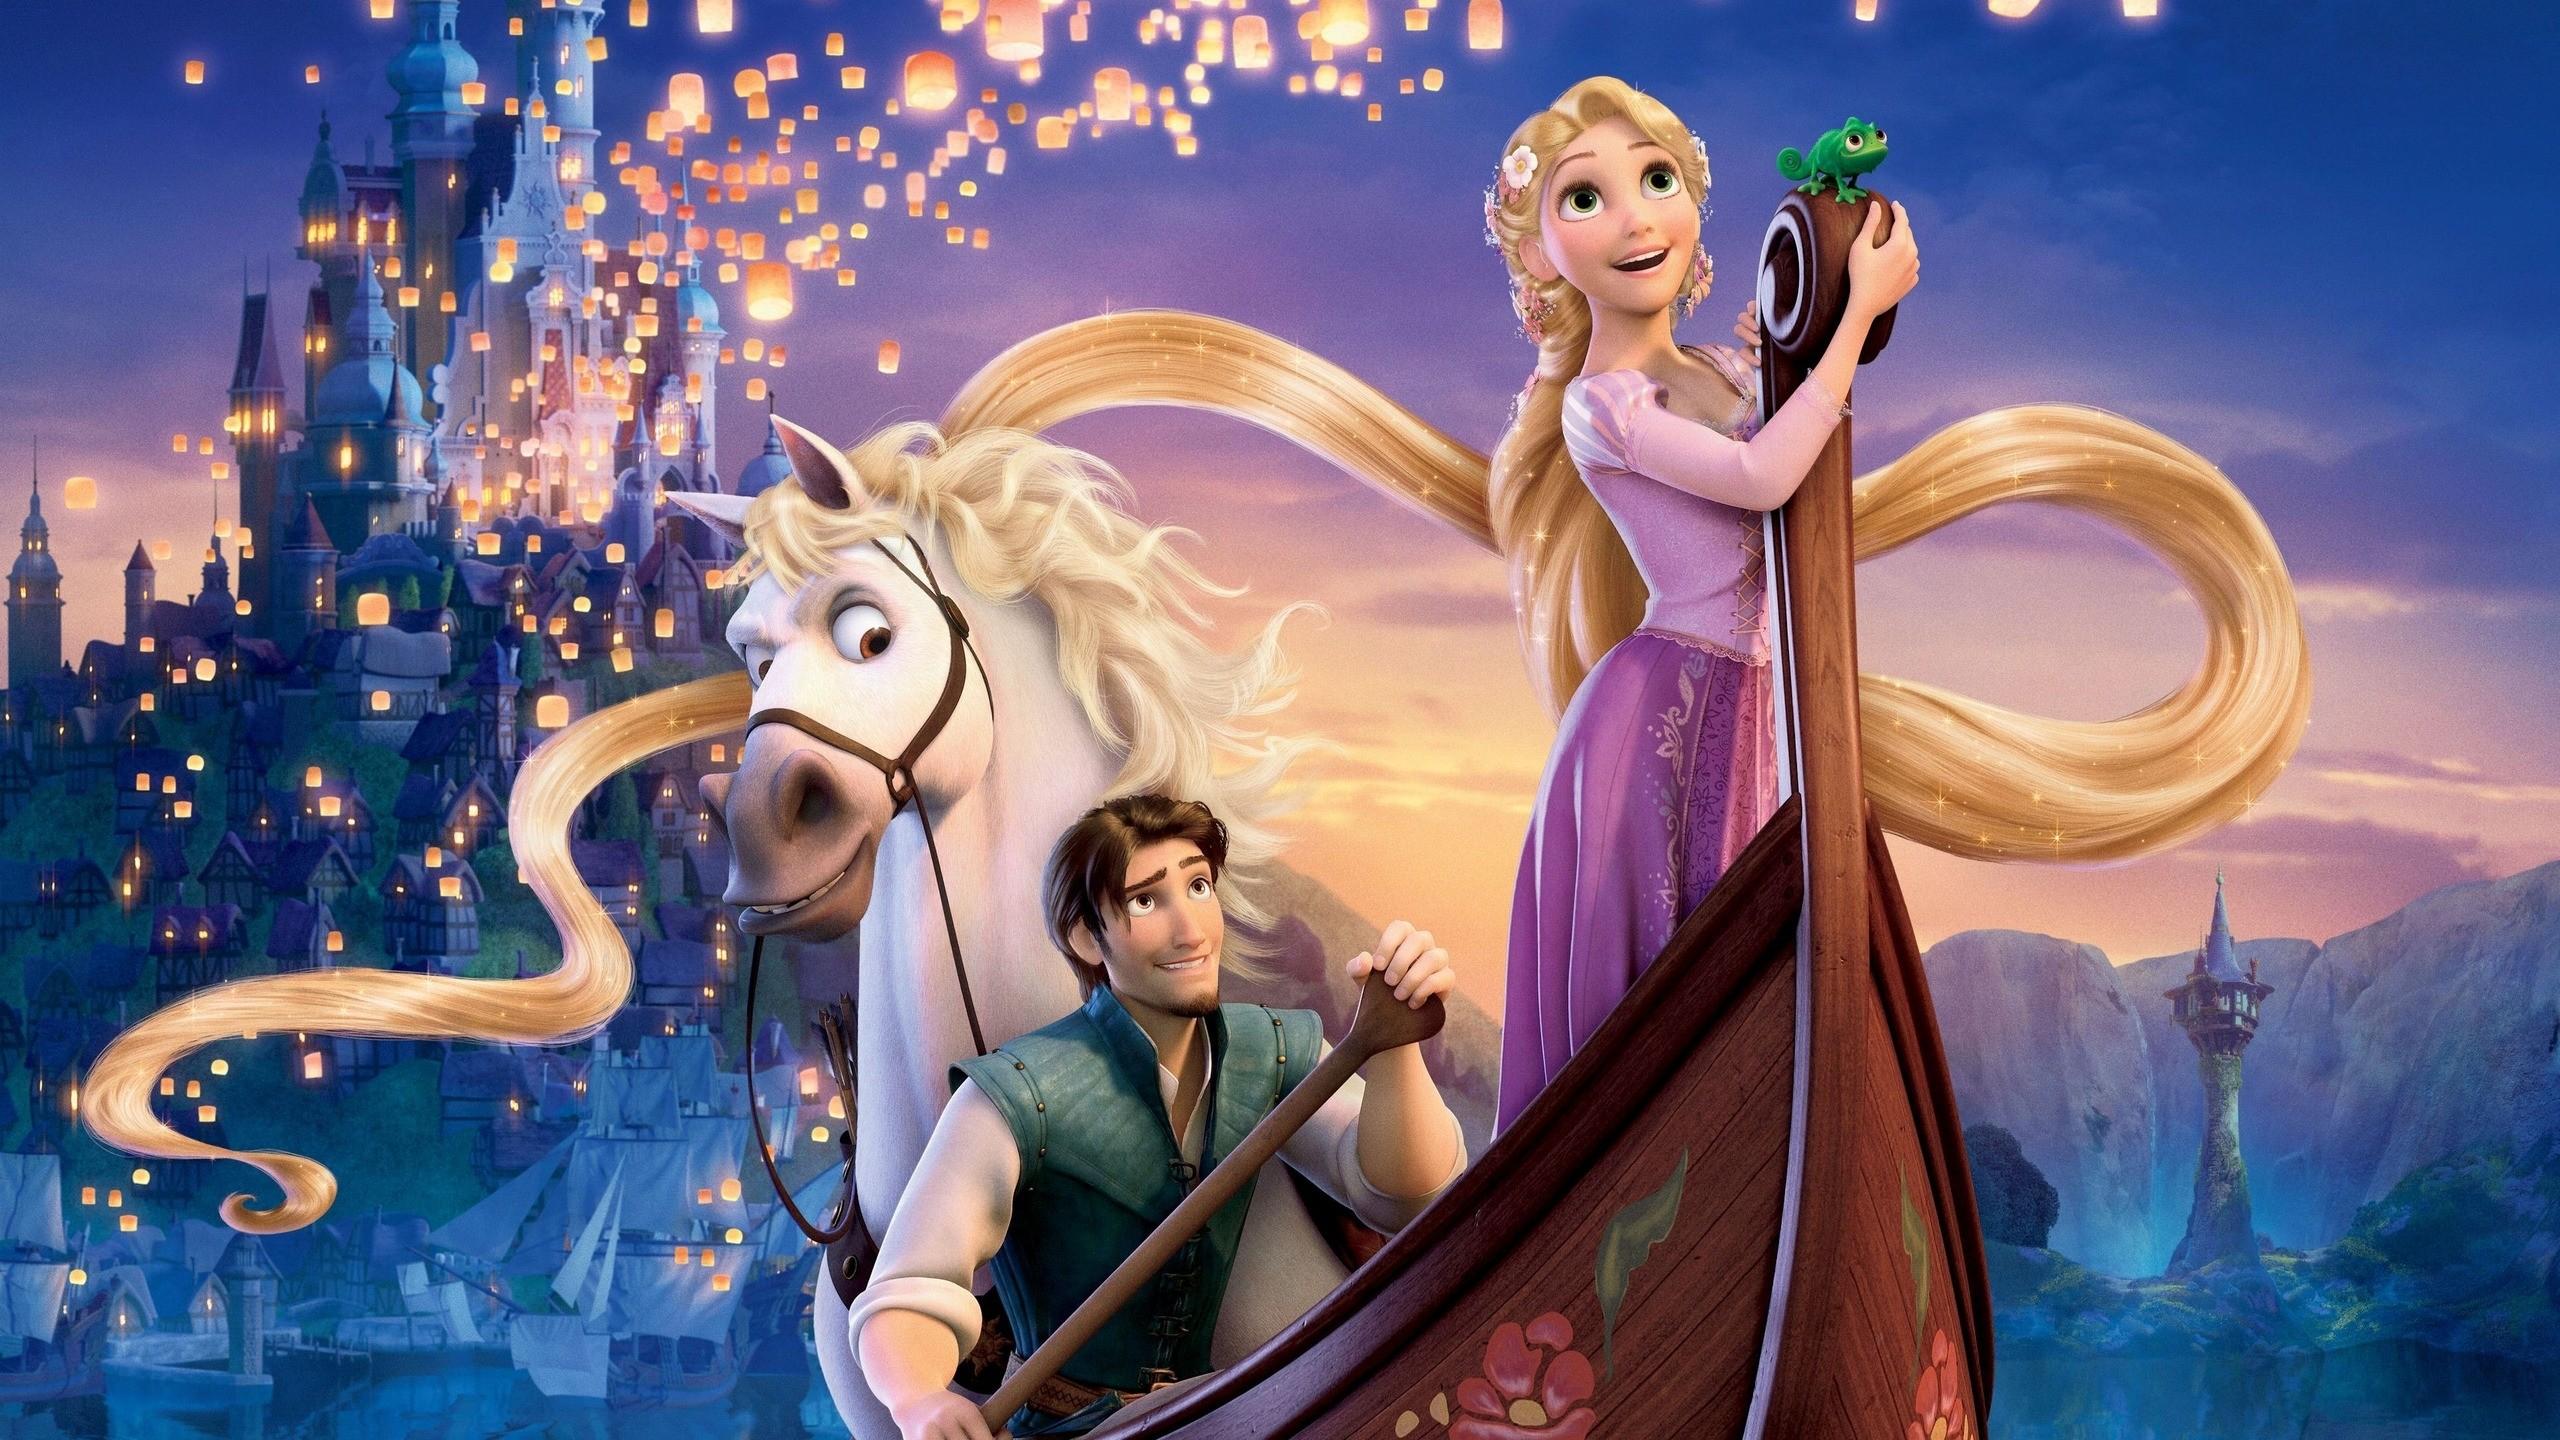 Disney Princess Wallpaper Desktop 2560×1440 #25594 HD Wallpaper Res .